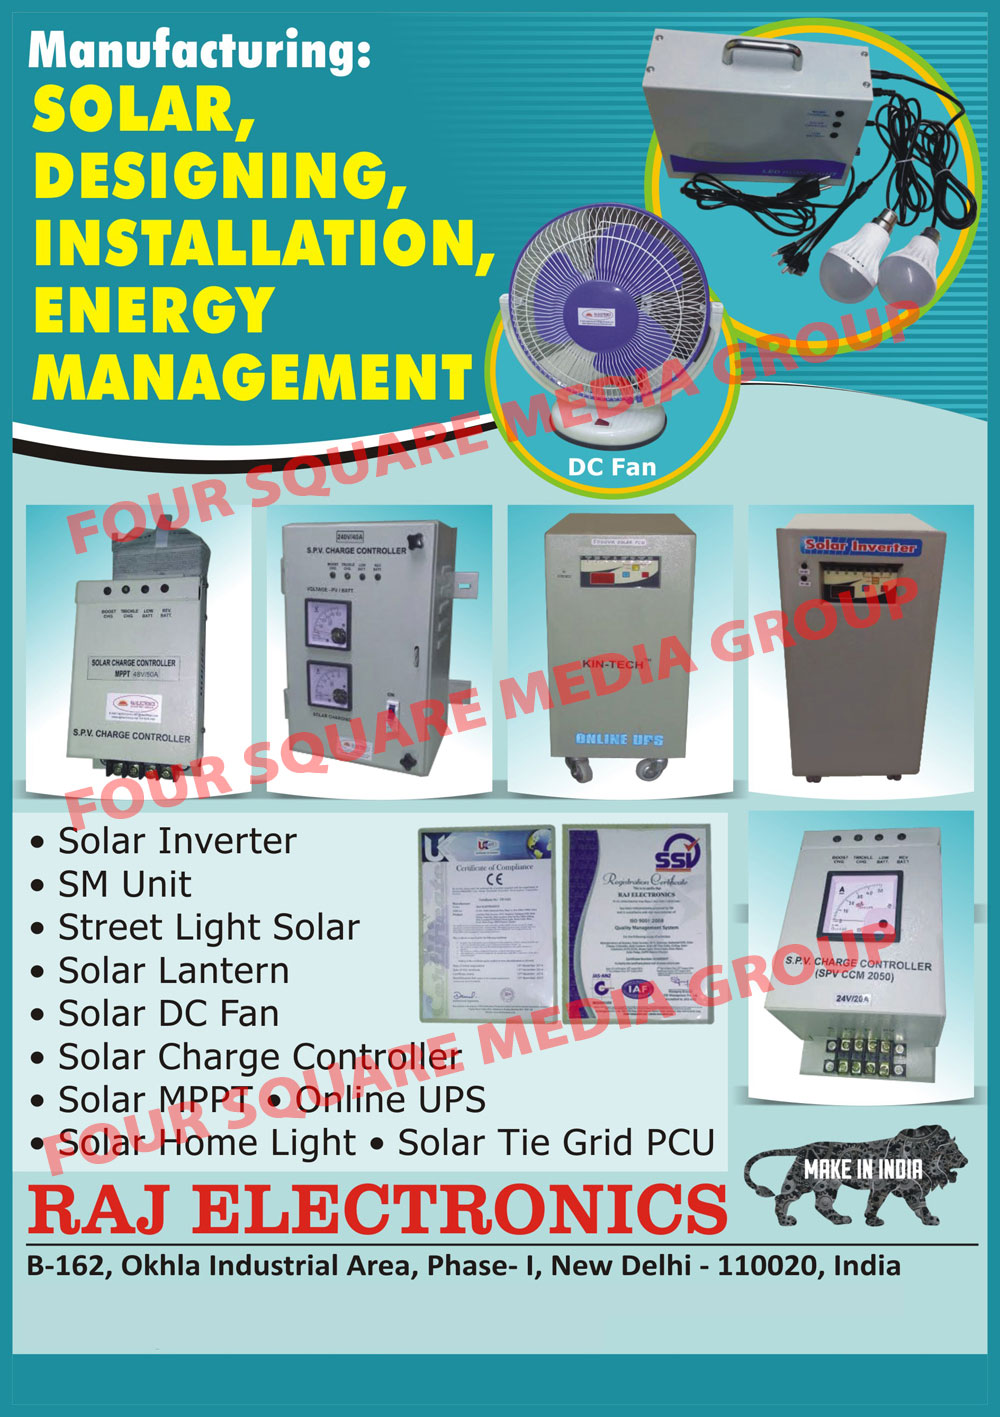 Solar Inverters, Solar Street Lights, Solar Lanterns, Solar DC Table Fans, Solar Charge Controllers, Solar MPPT, Online UPS, Solar Tie Grid PCU, Solar Home Lights